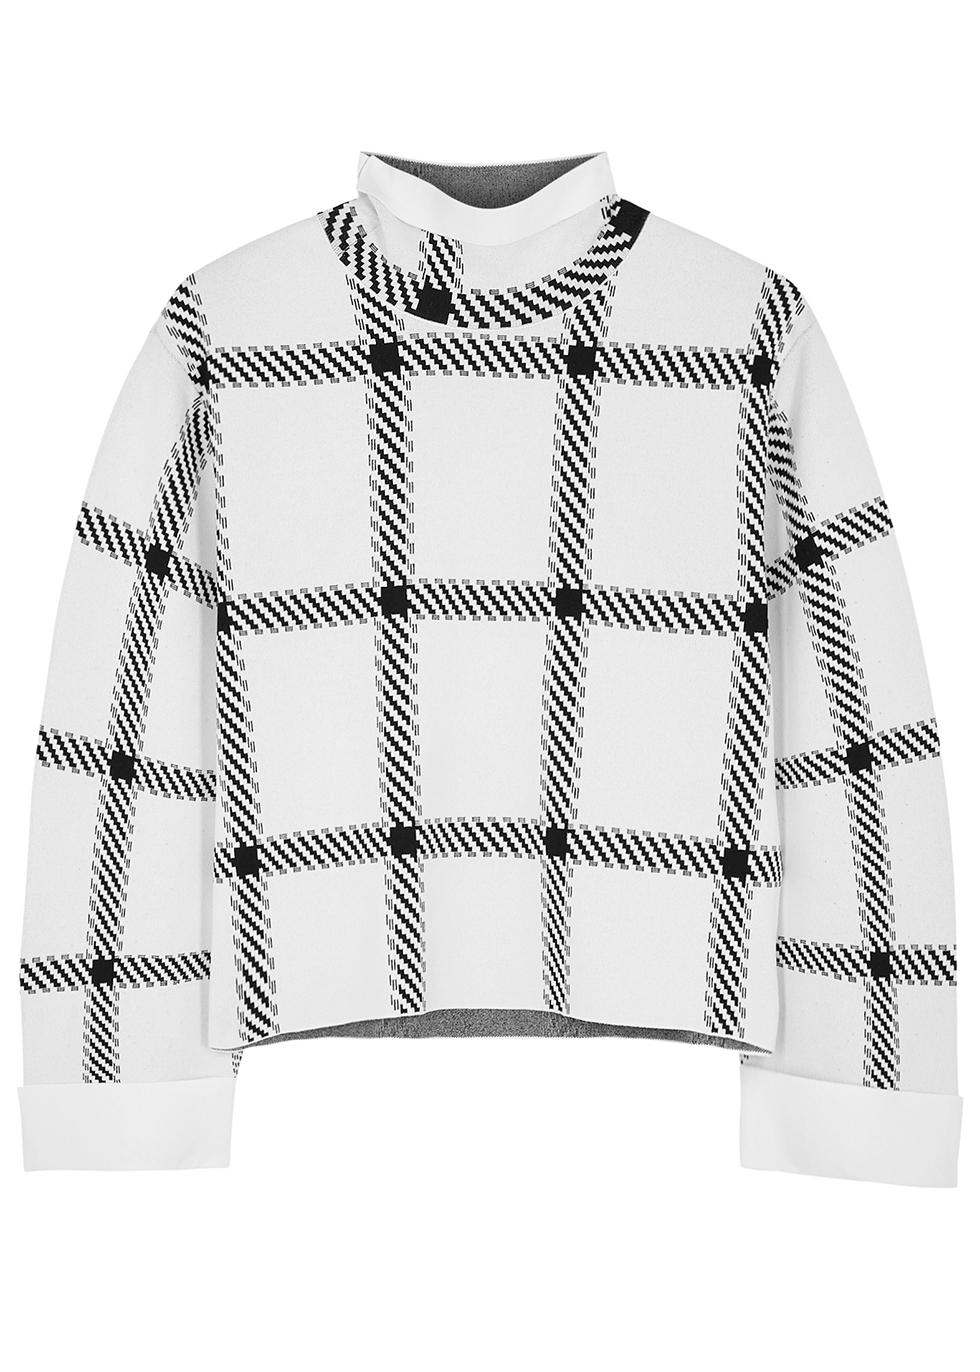 Check-intarsia stretch-knit top